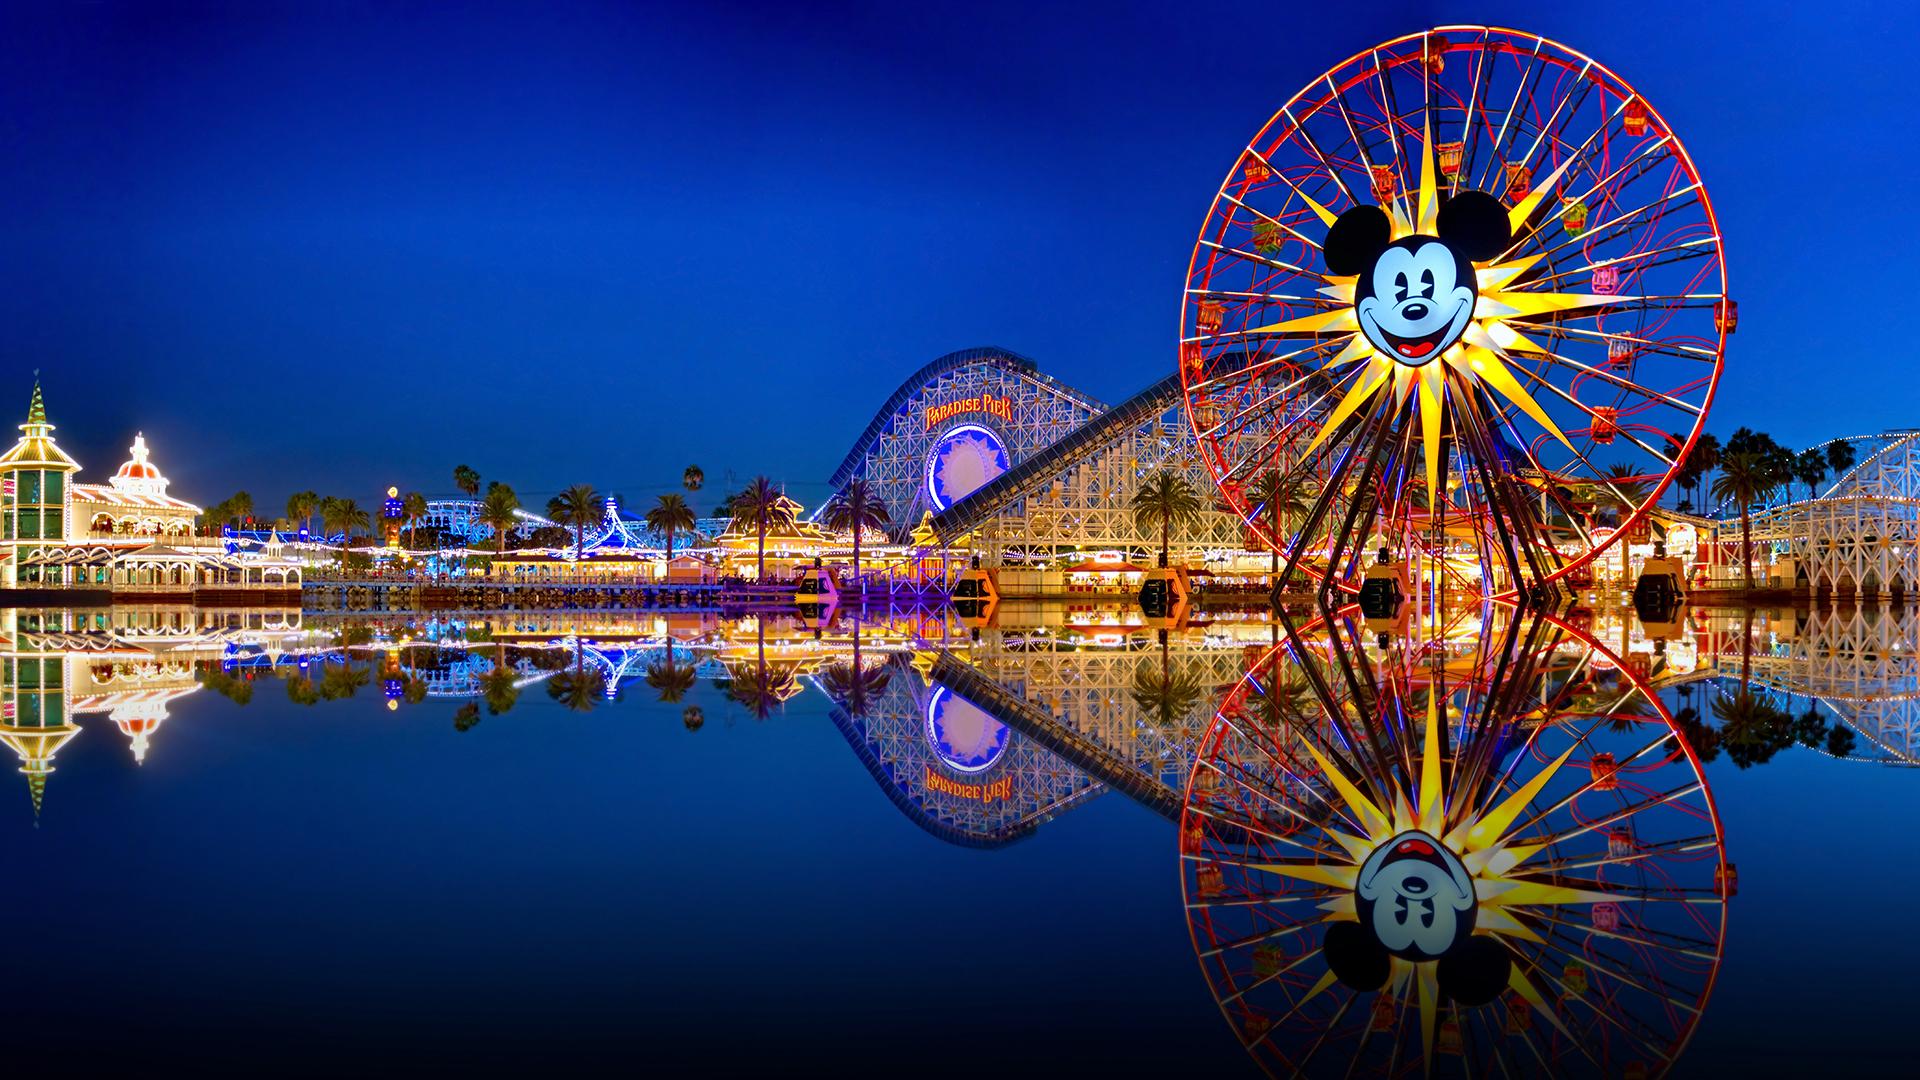 Executive Inn Disneyland 04